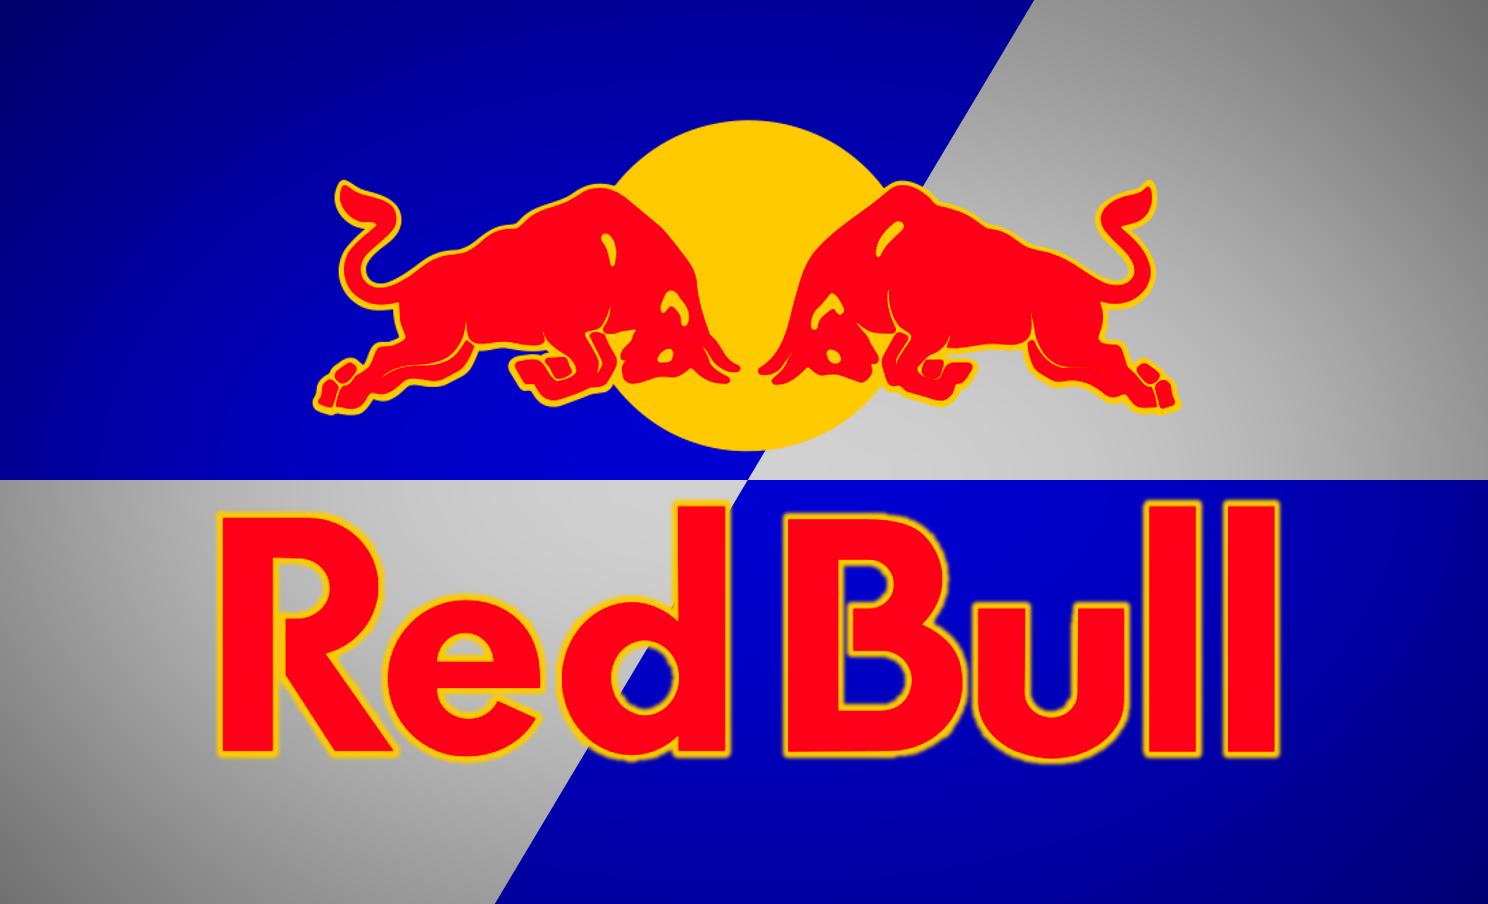 Red Bull Logo PNG - 32245